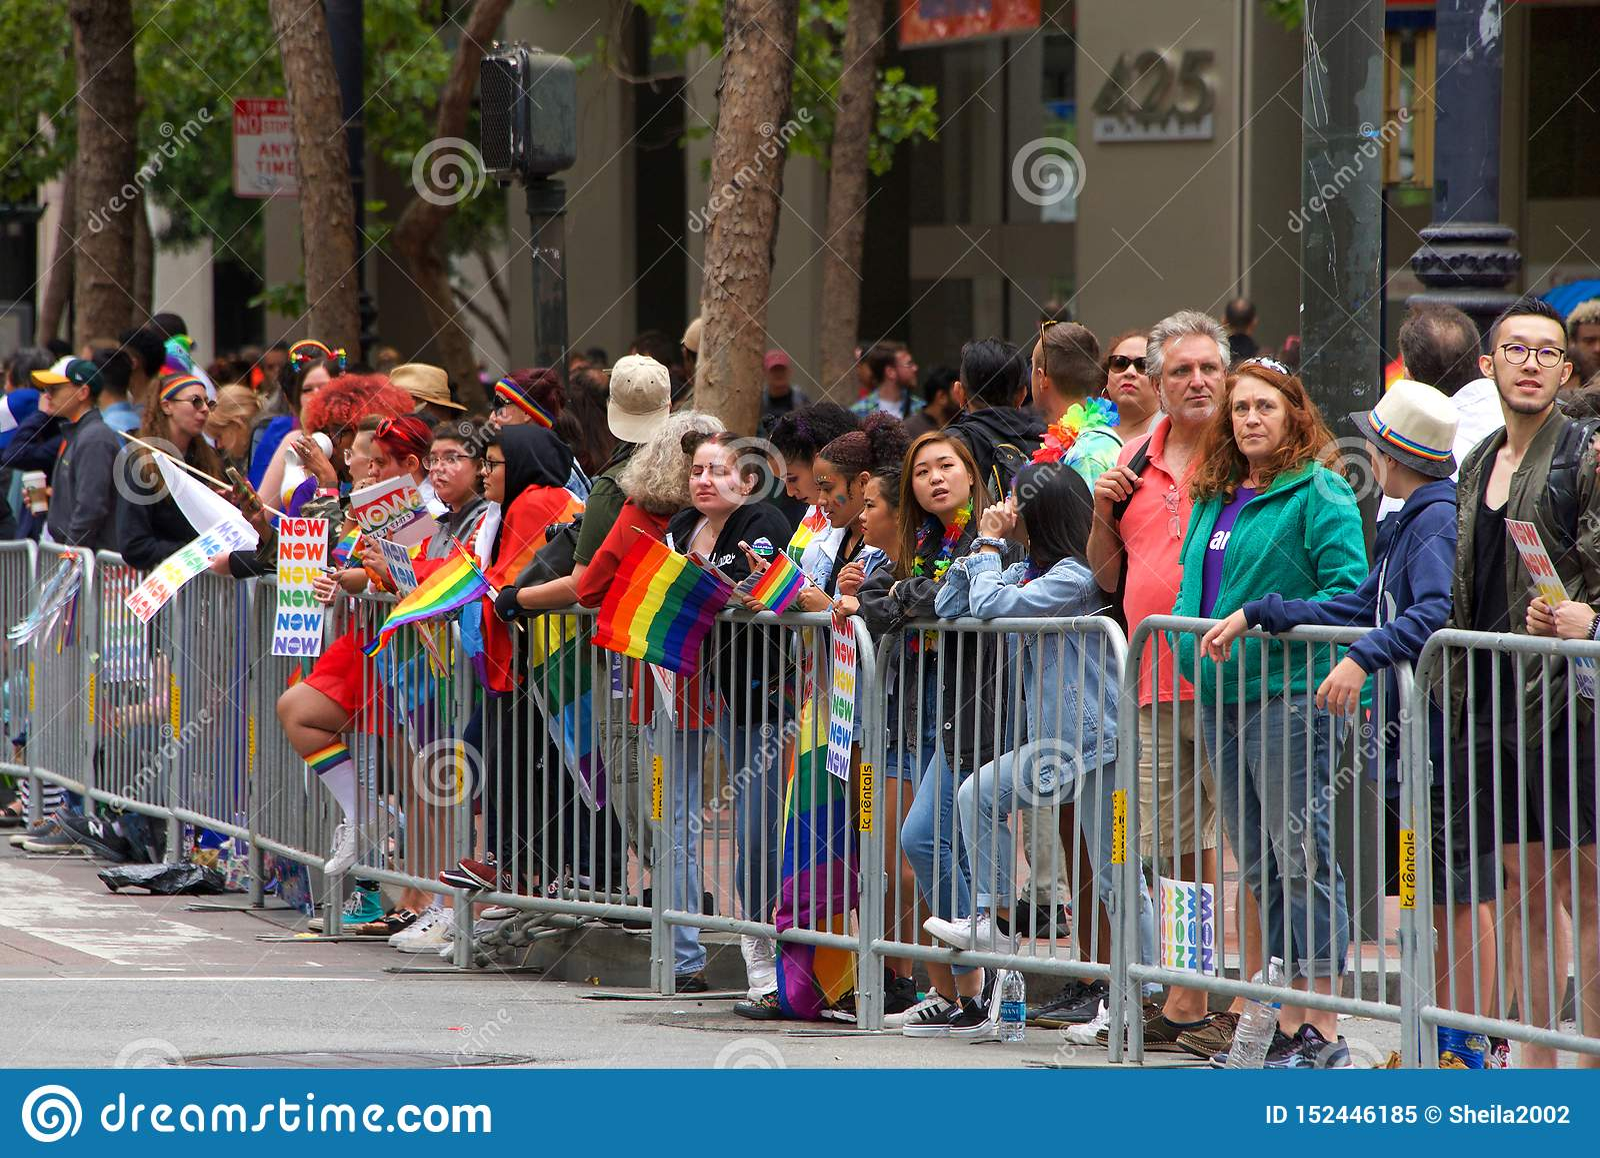 San Francisco 49th Annual Gay Pride Parade Editorial Stock